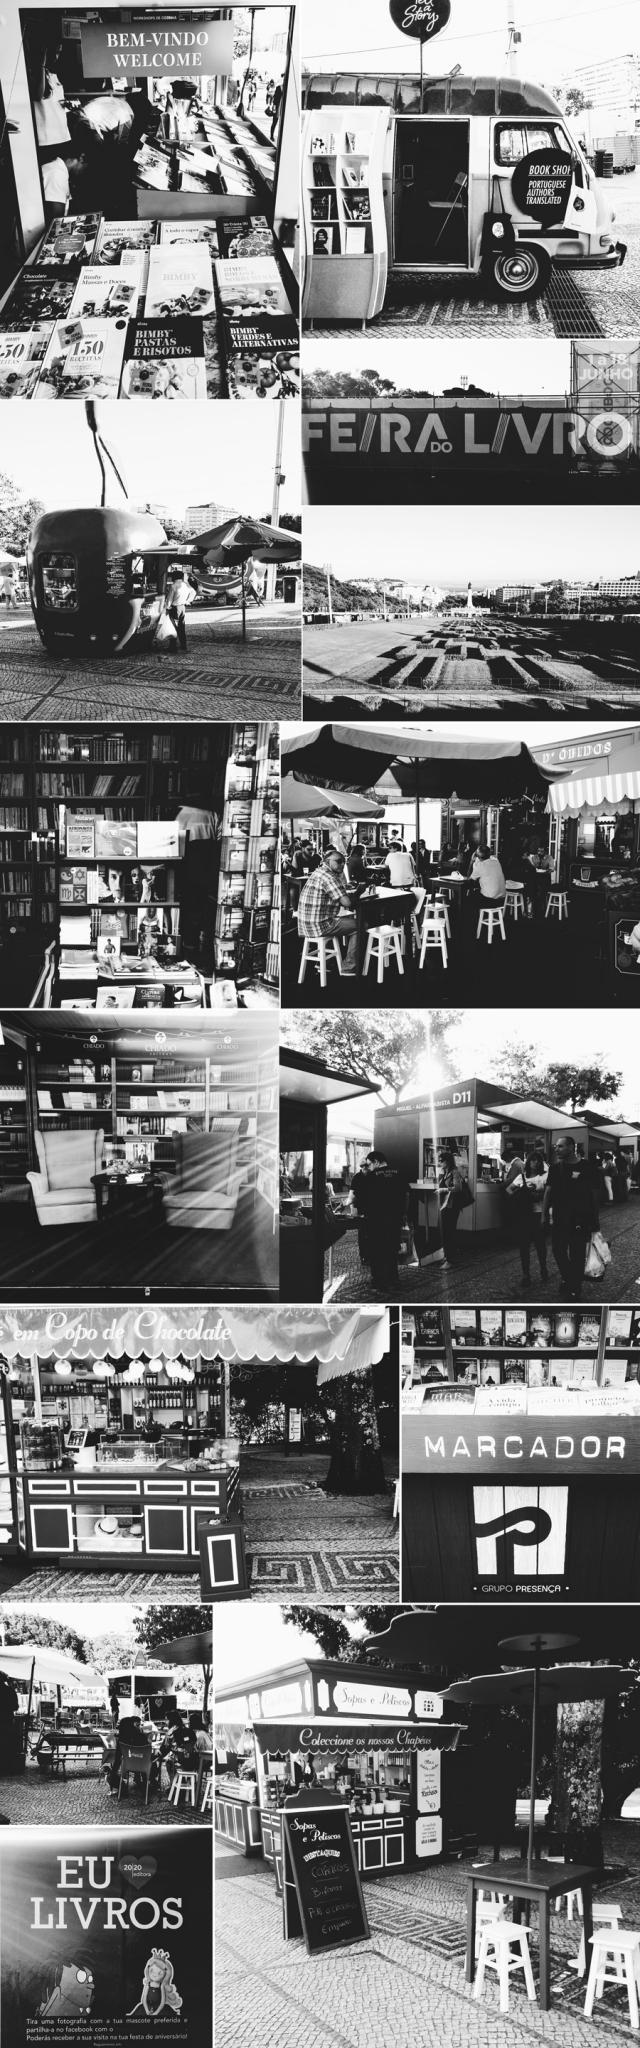 Feira do Livro Lisboa 87